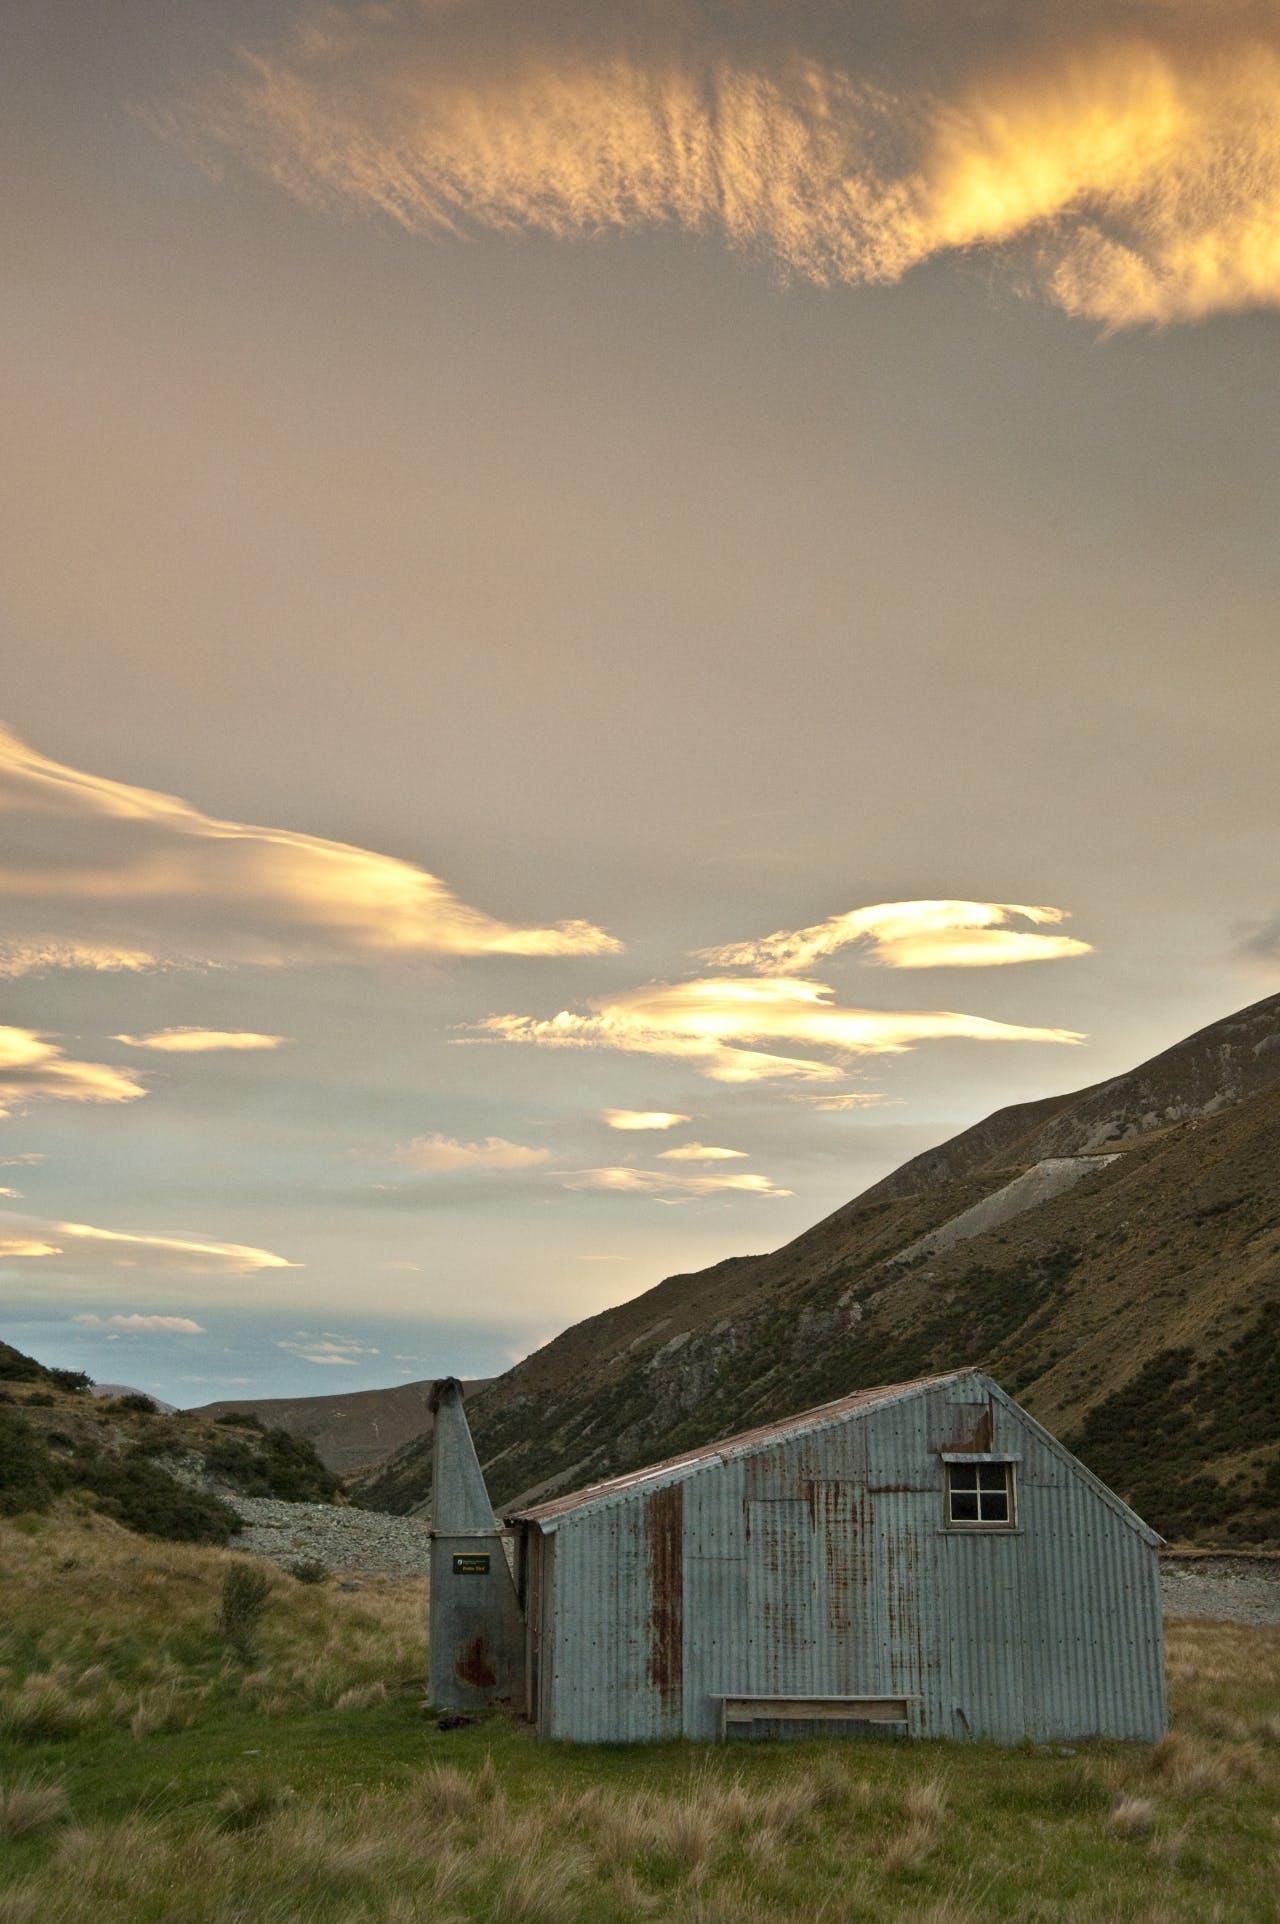 Sunset over Potts hut. Photo: Shaun Barnett/Black Robin Photography